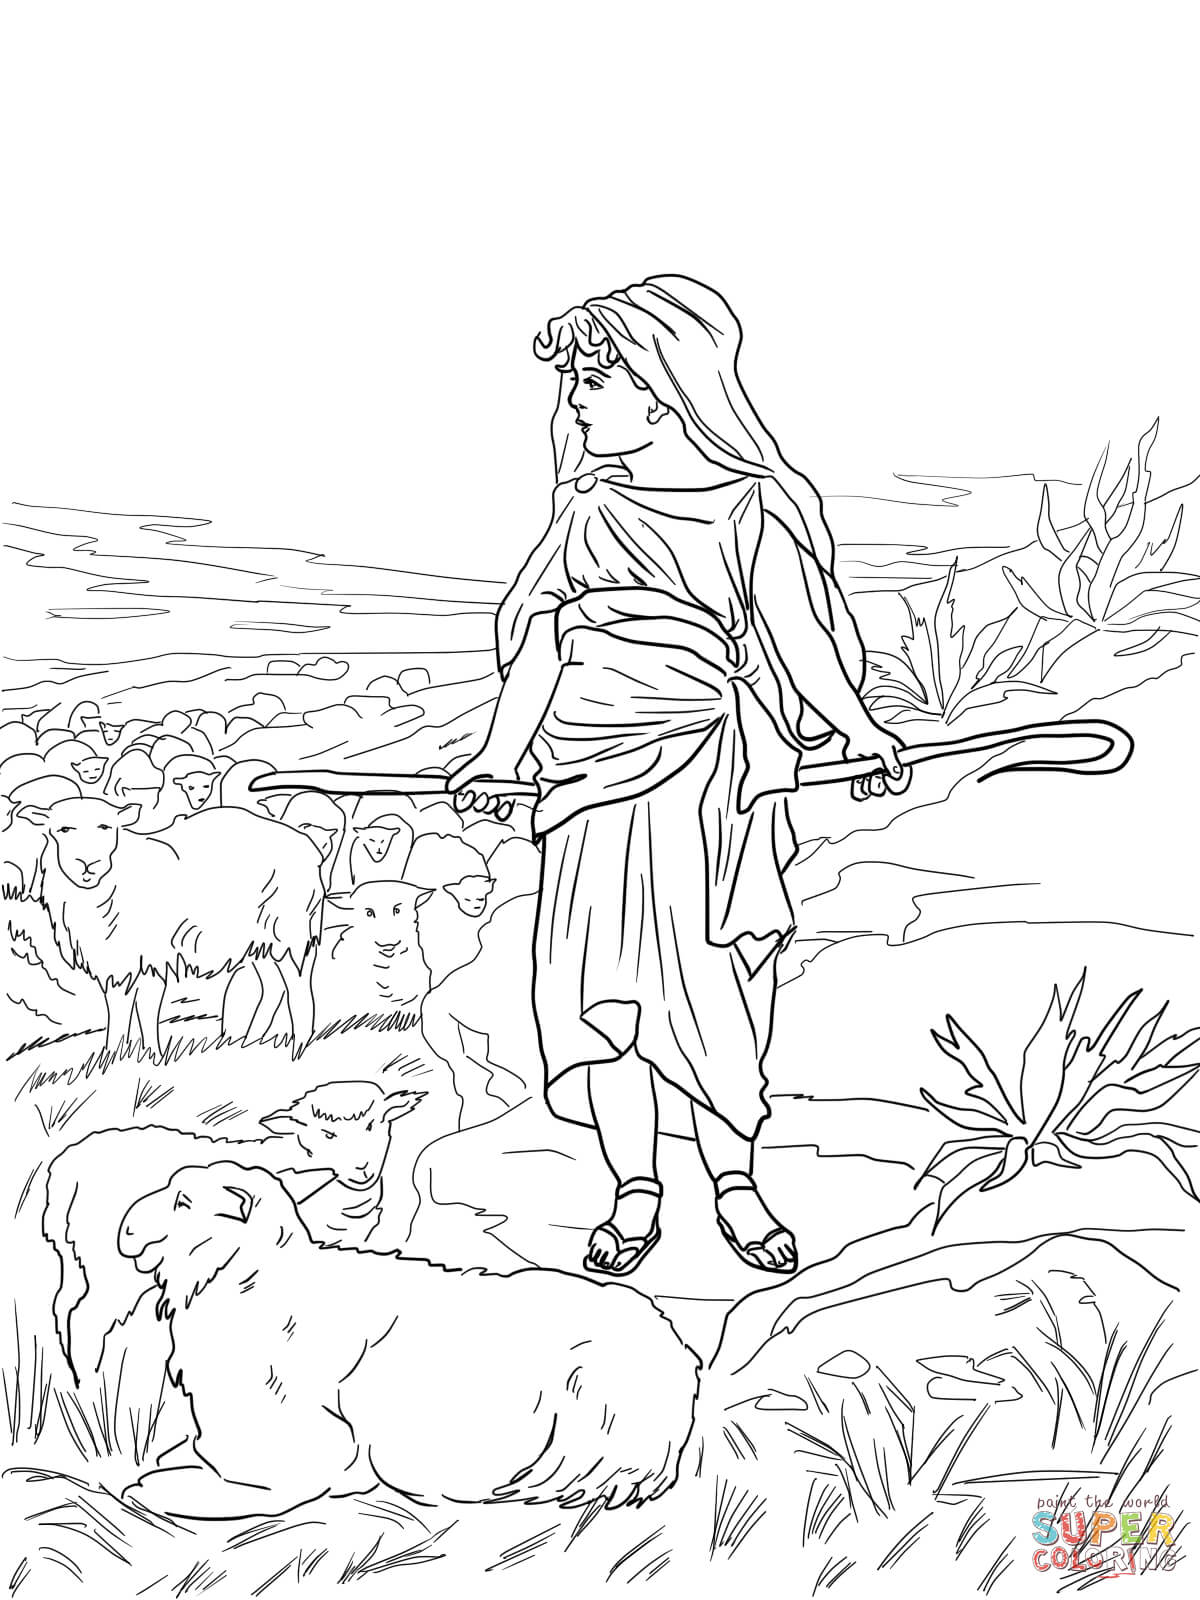 1200x1600 Now David The Shepherd Coloring Page Olegratiy